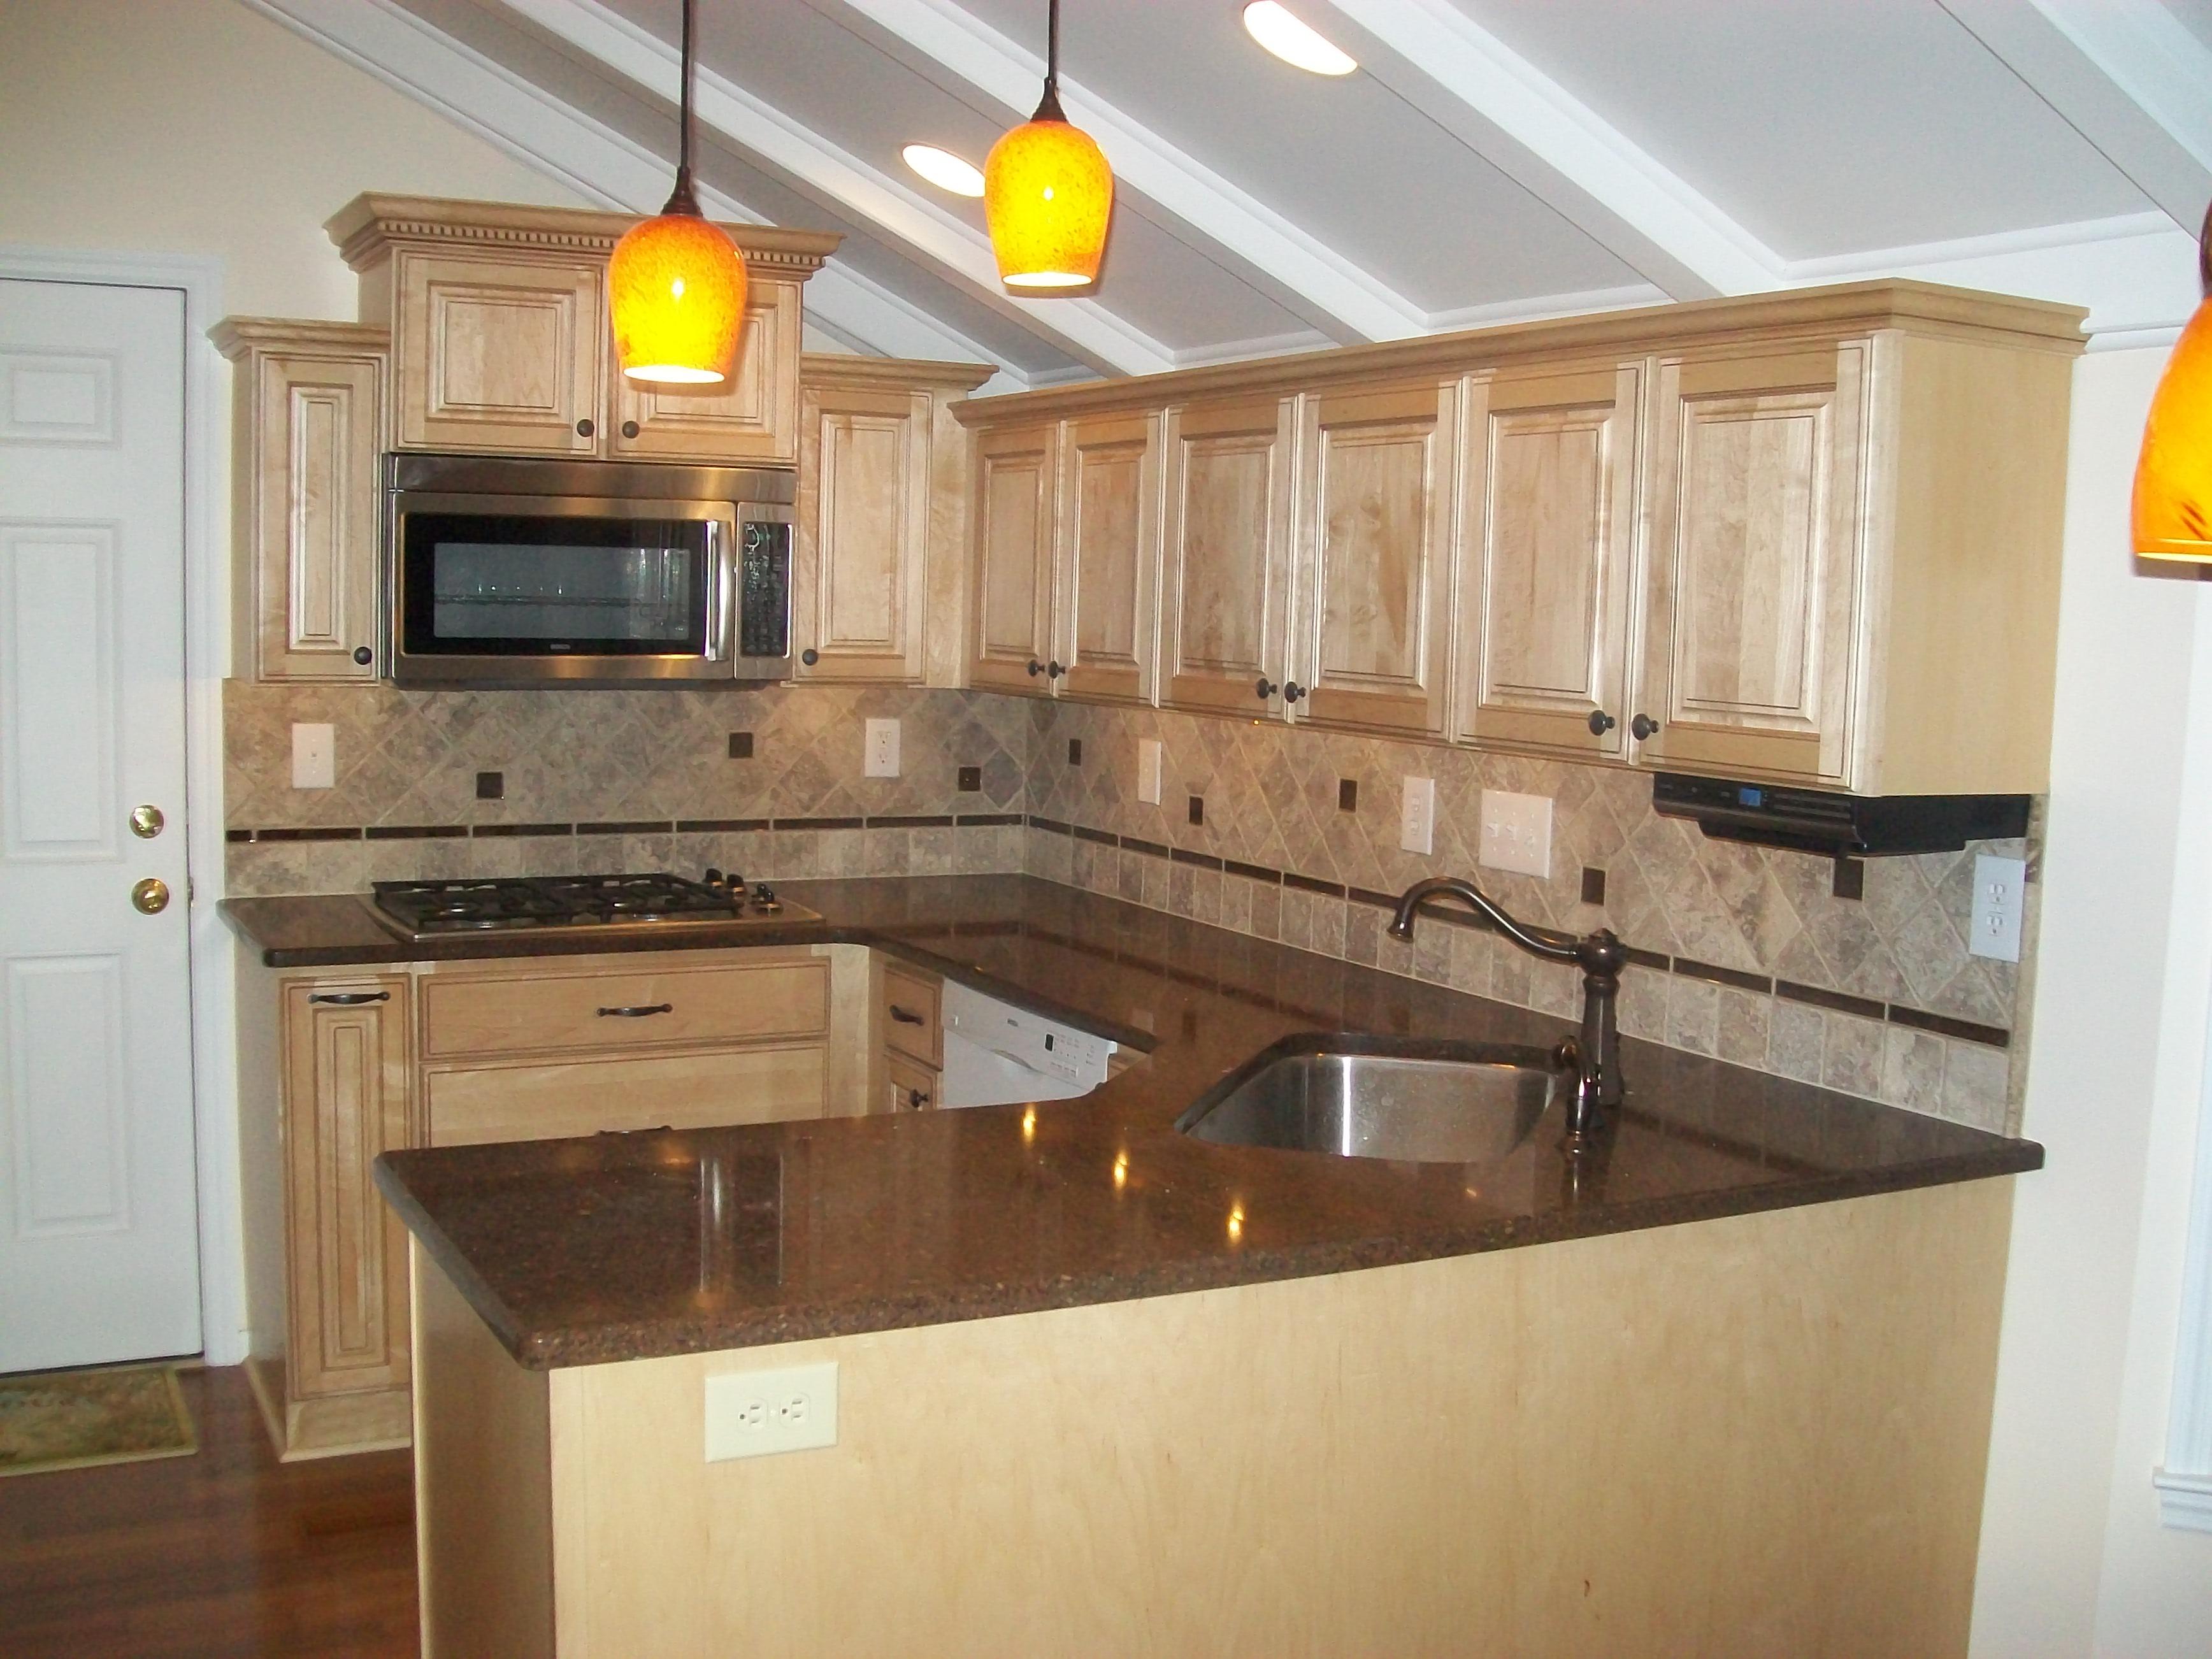 Finished Kitchens - B&M Custom Carpentry